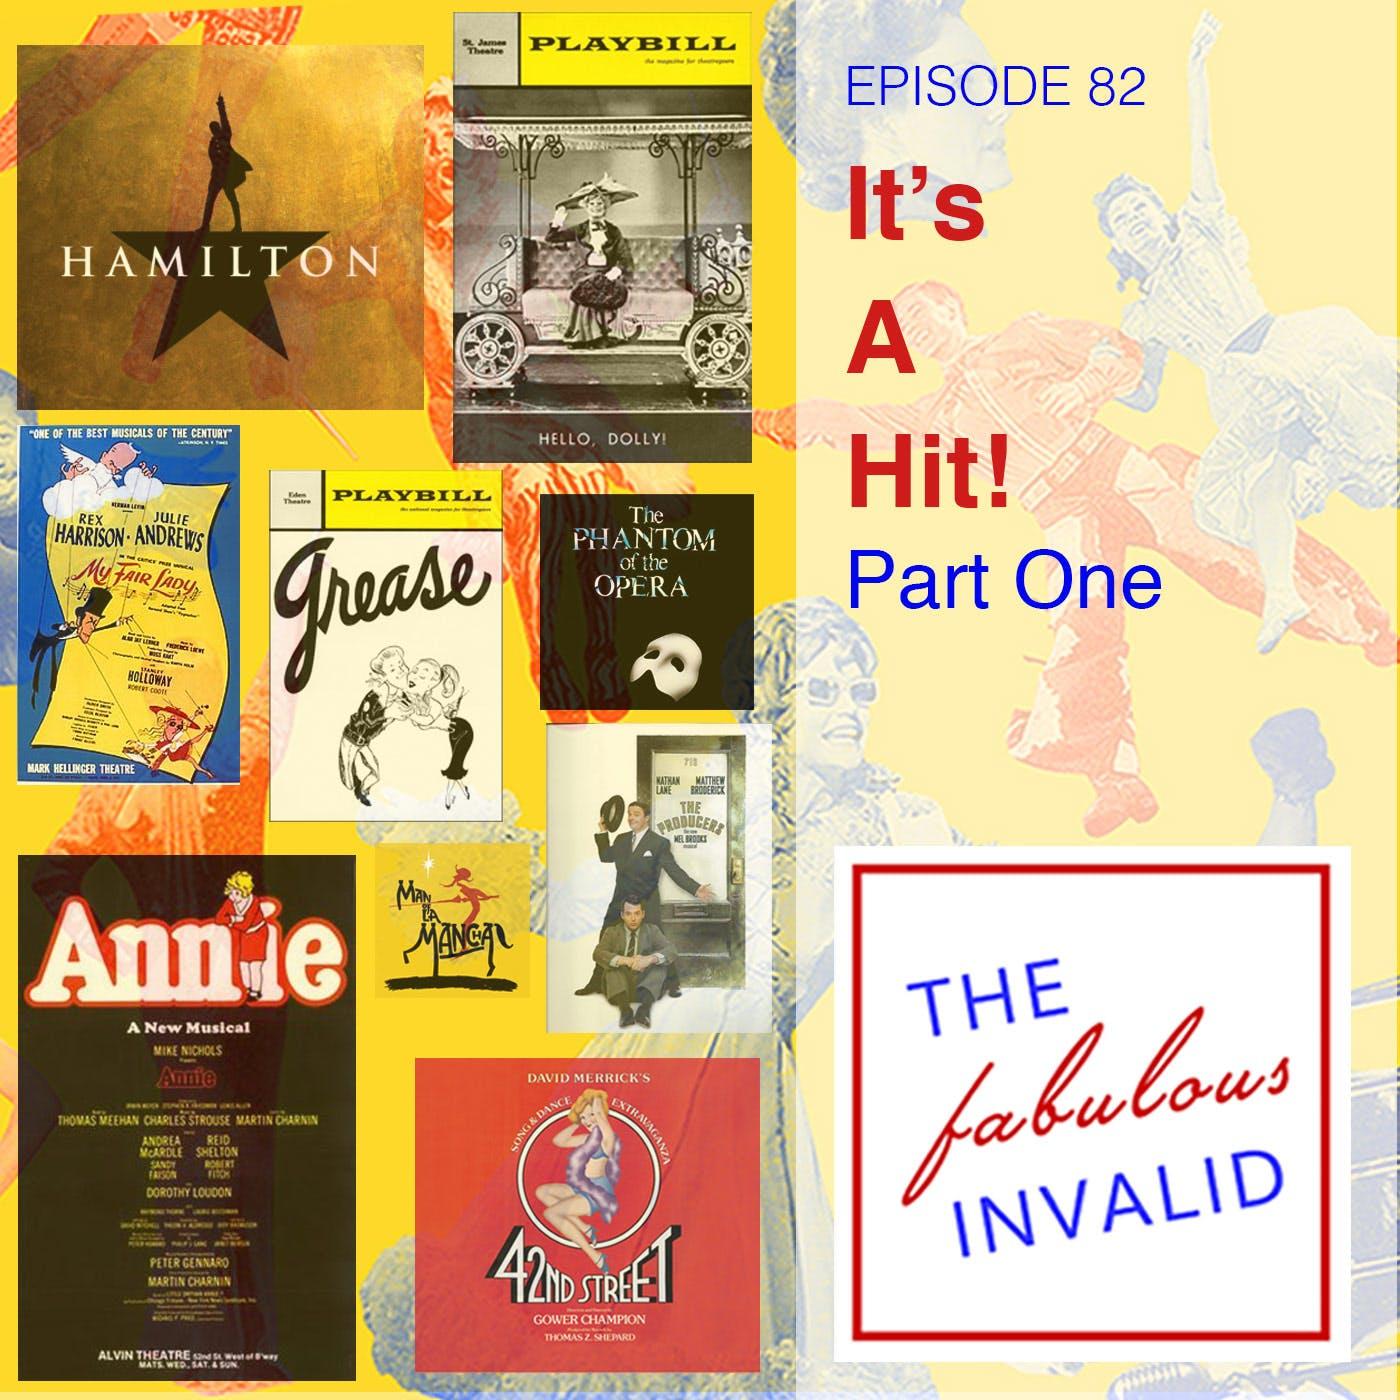 Episode 82: It's A Hit! Part One